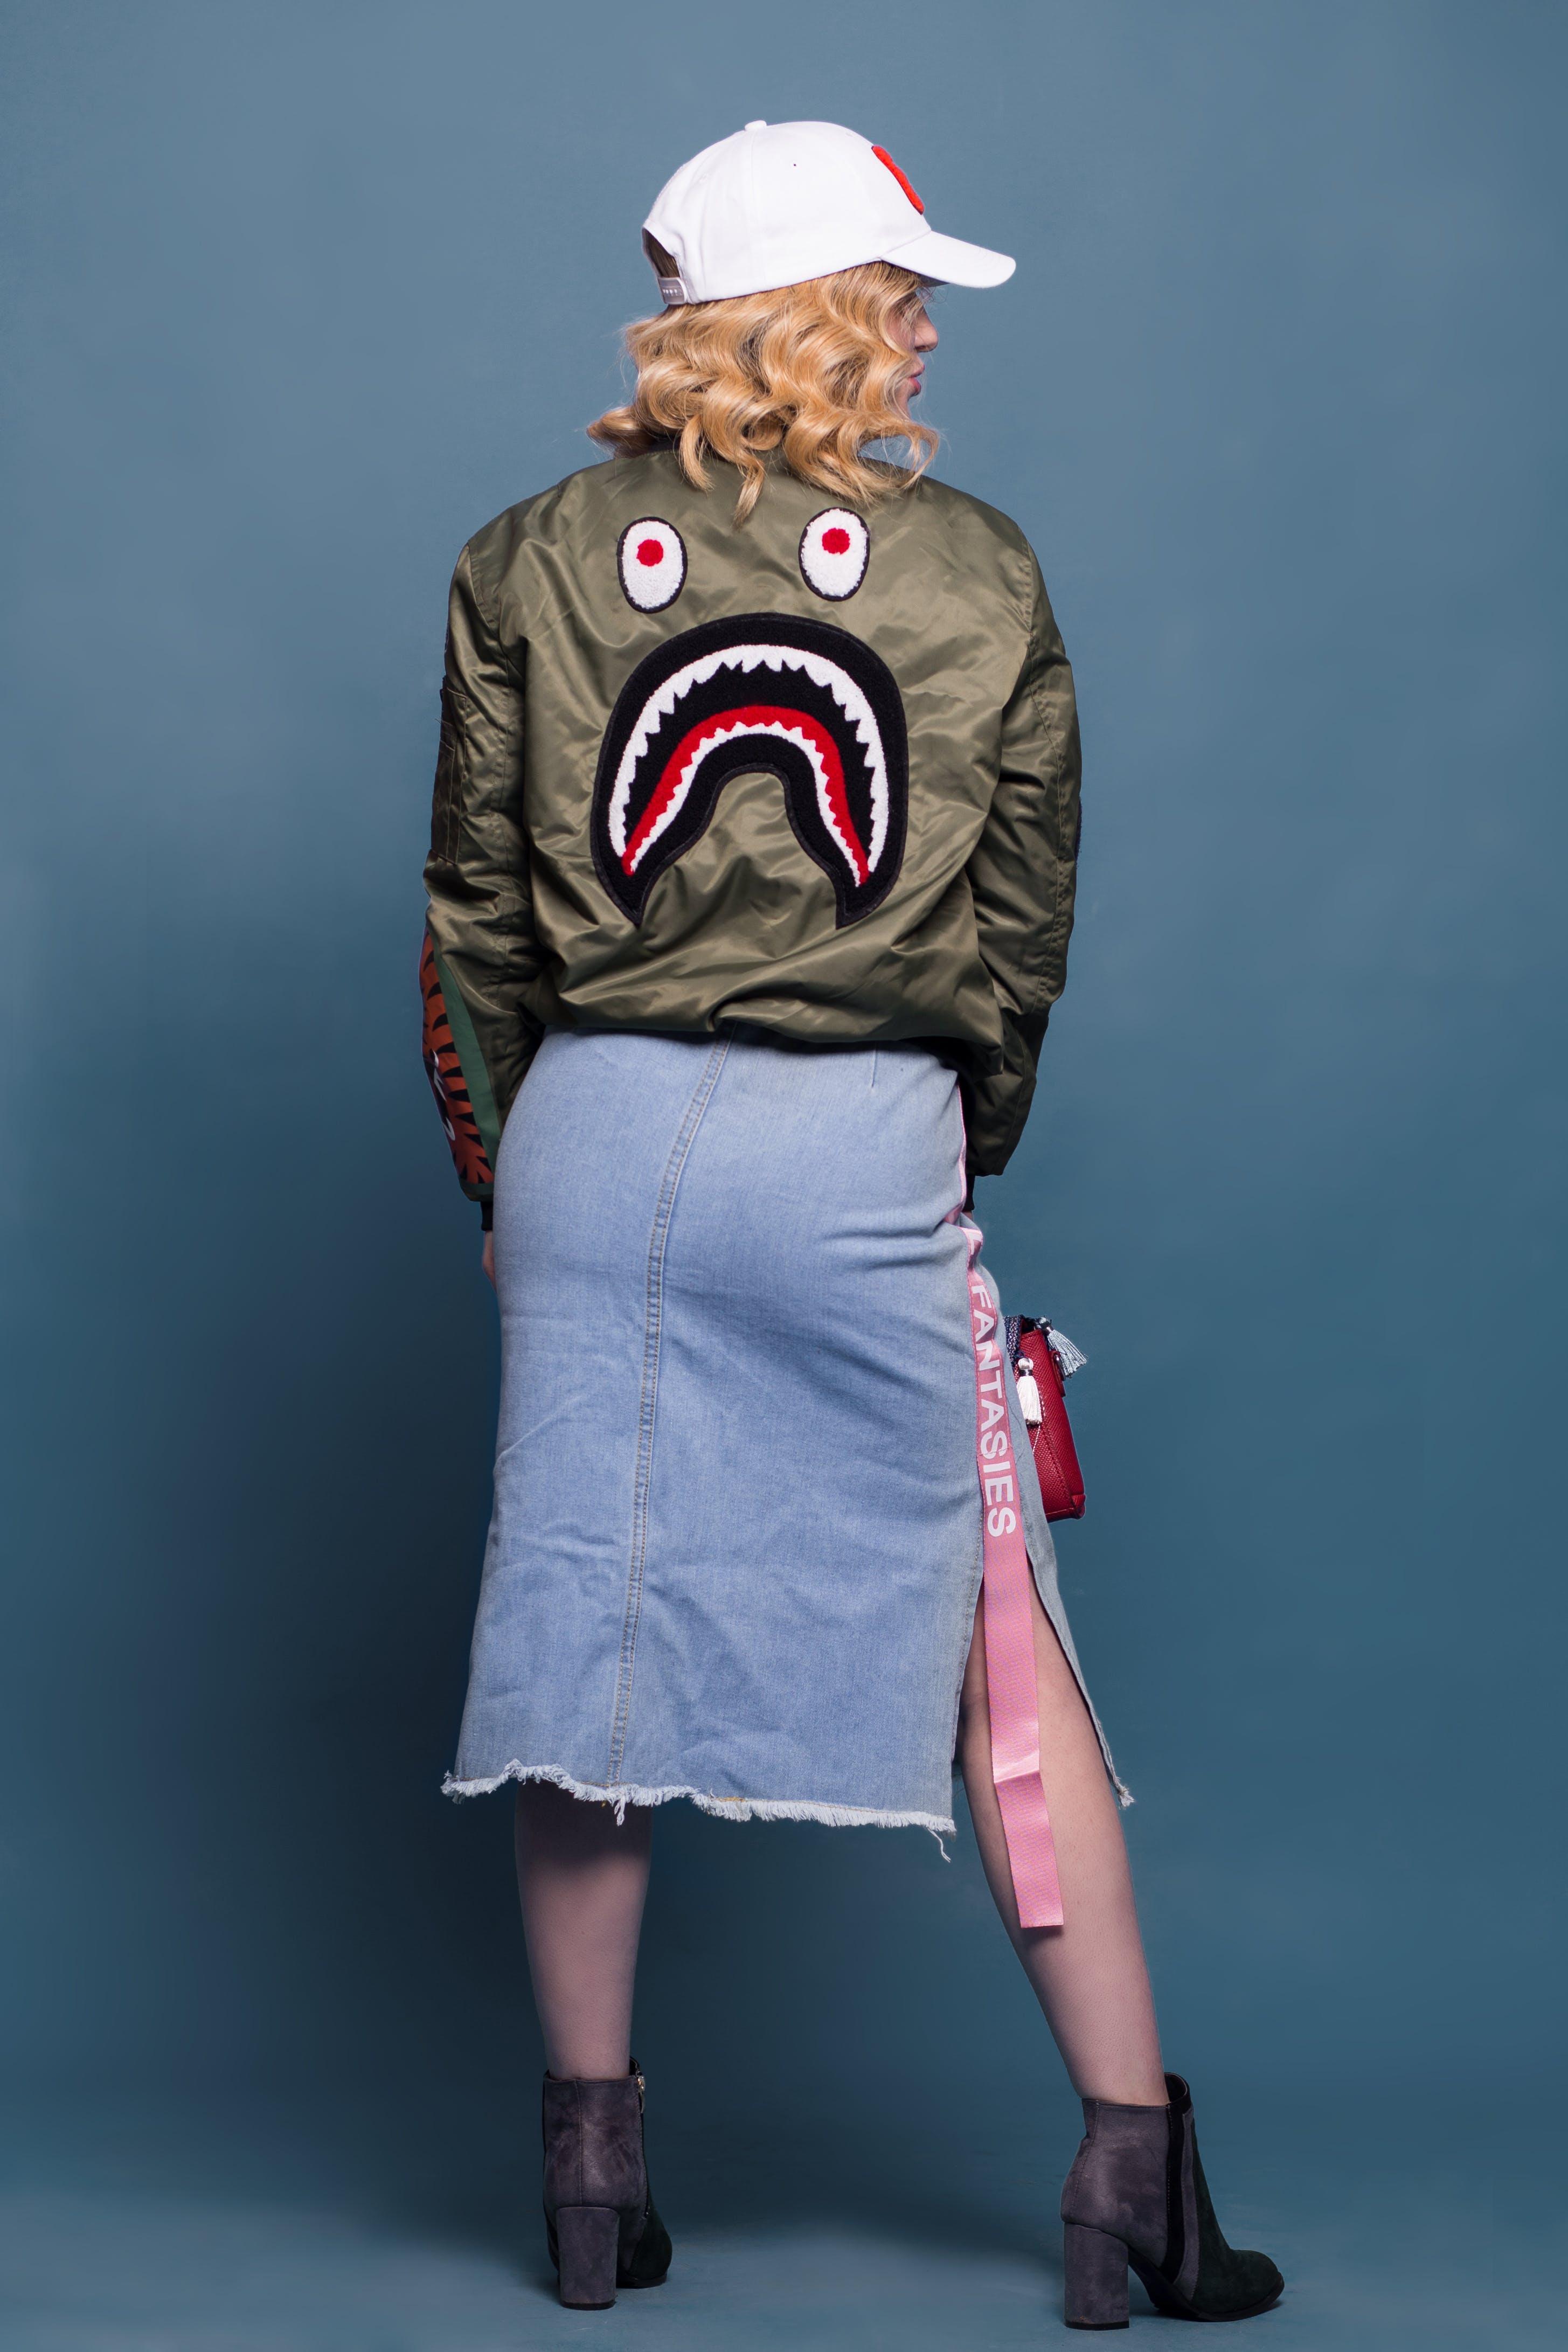 37 Brilliant DIY Clothes Tutorials, Ideas, And Clothing Hacks For Women